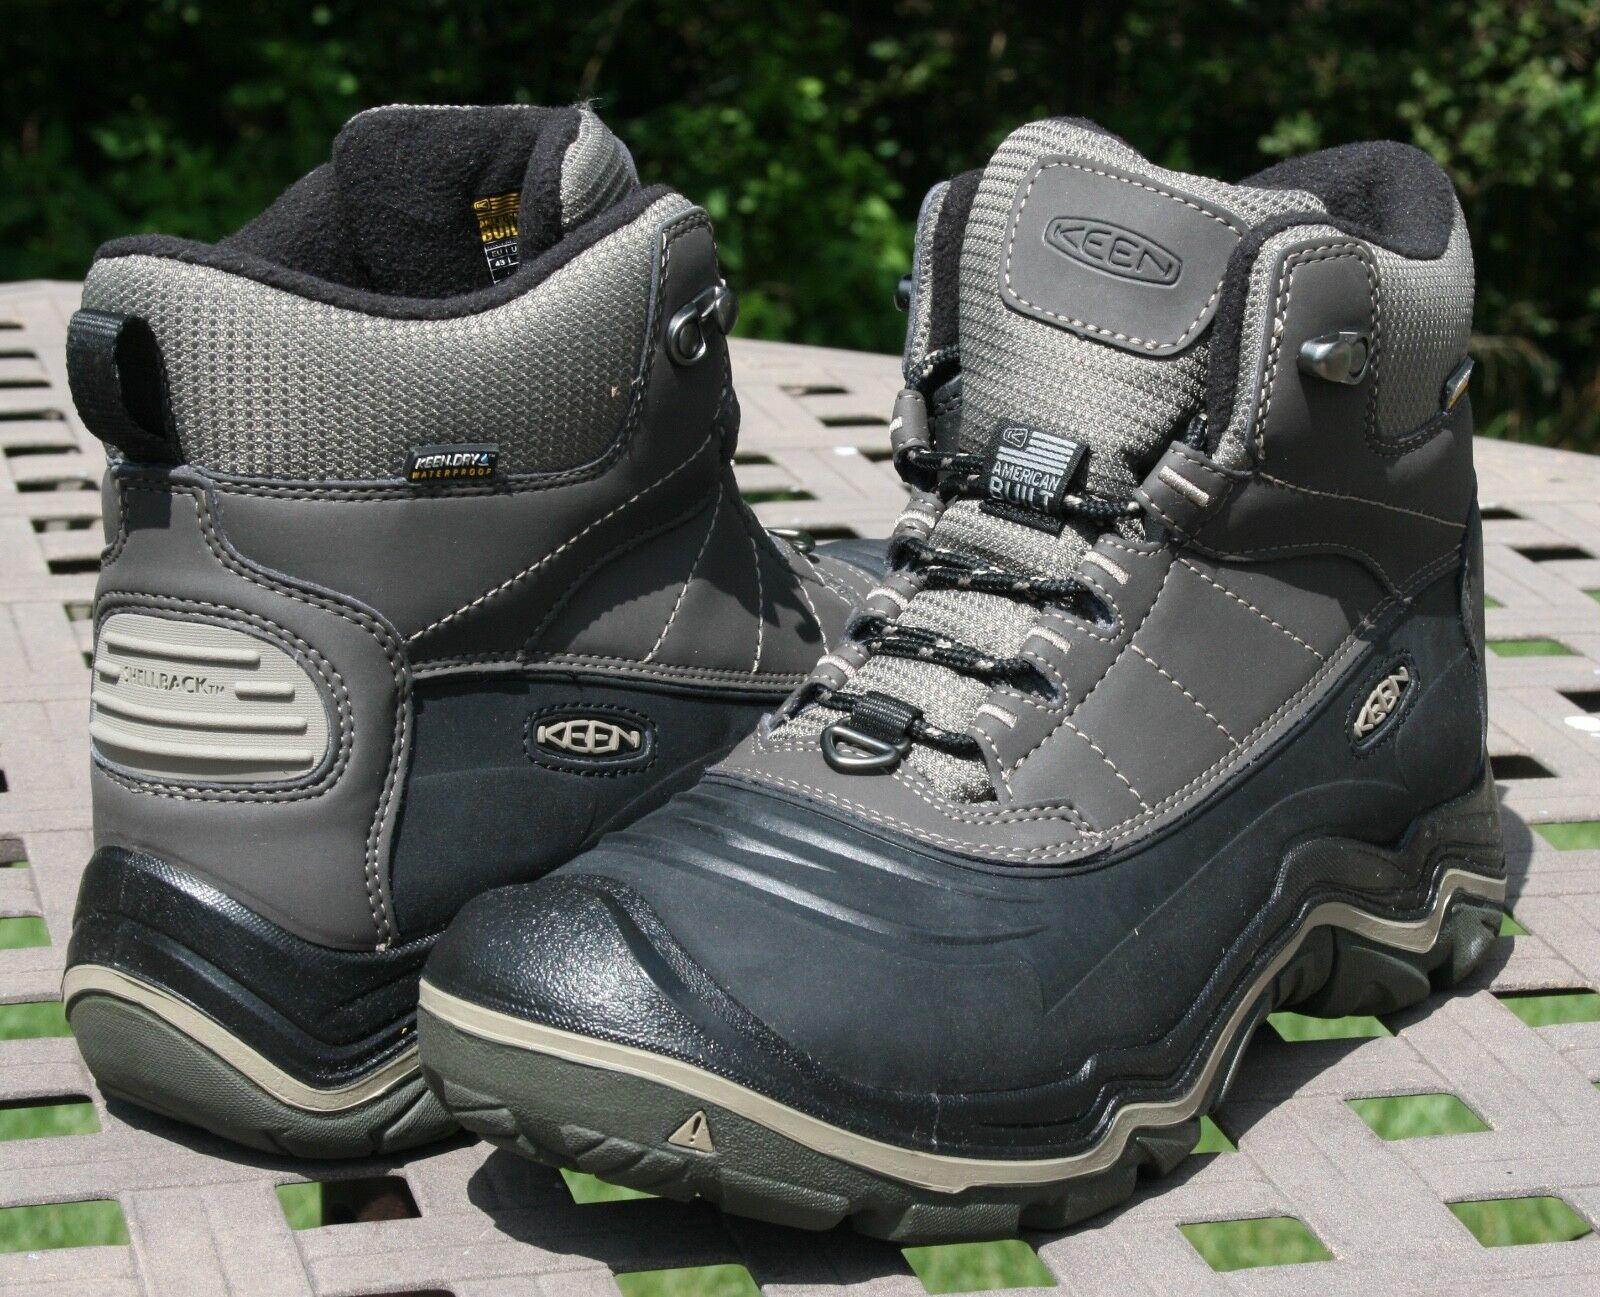 KEEN DURAND POLAR SHELL WP US 10 Men's Hiking Boot